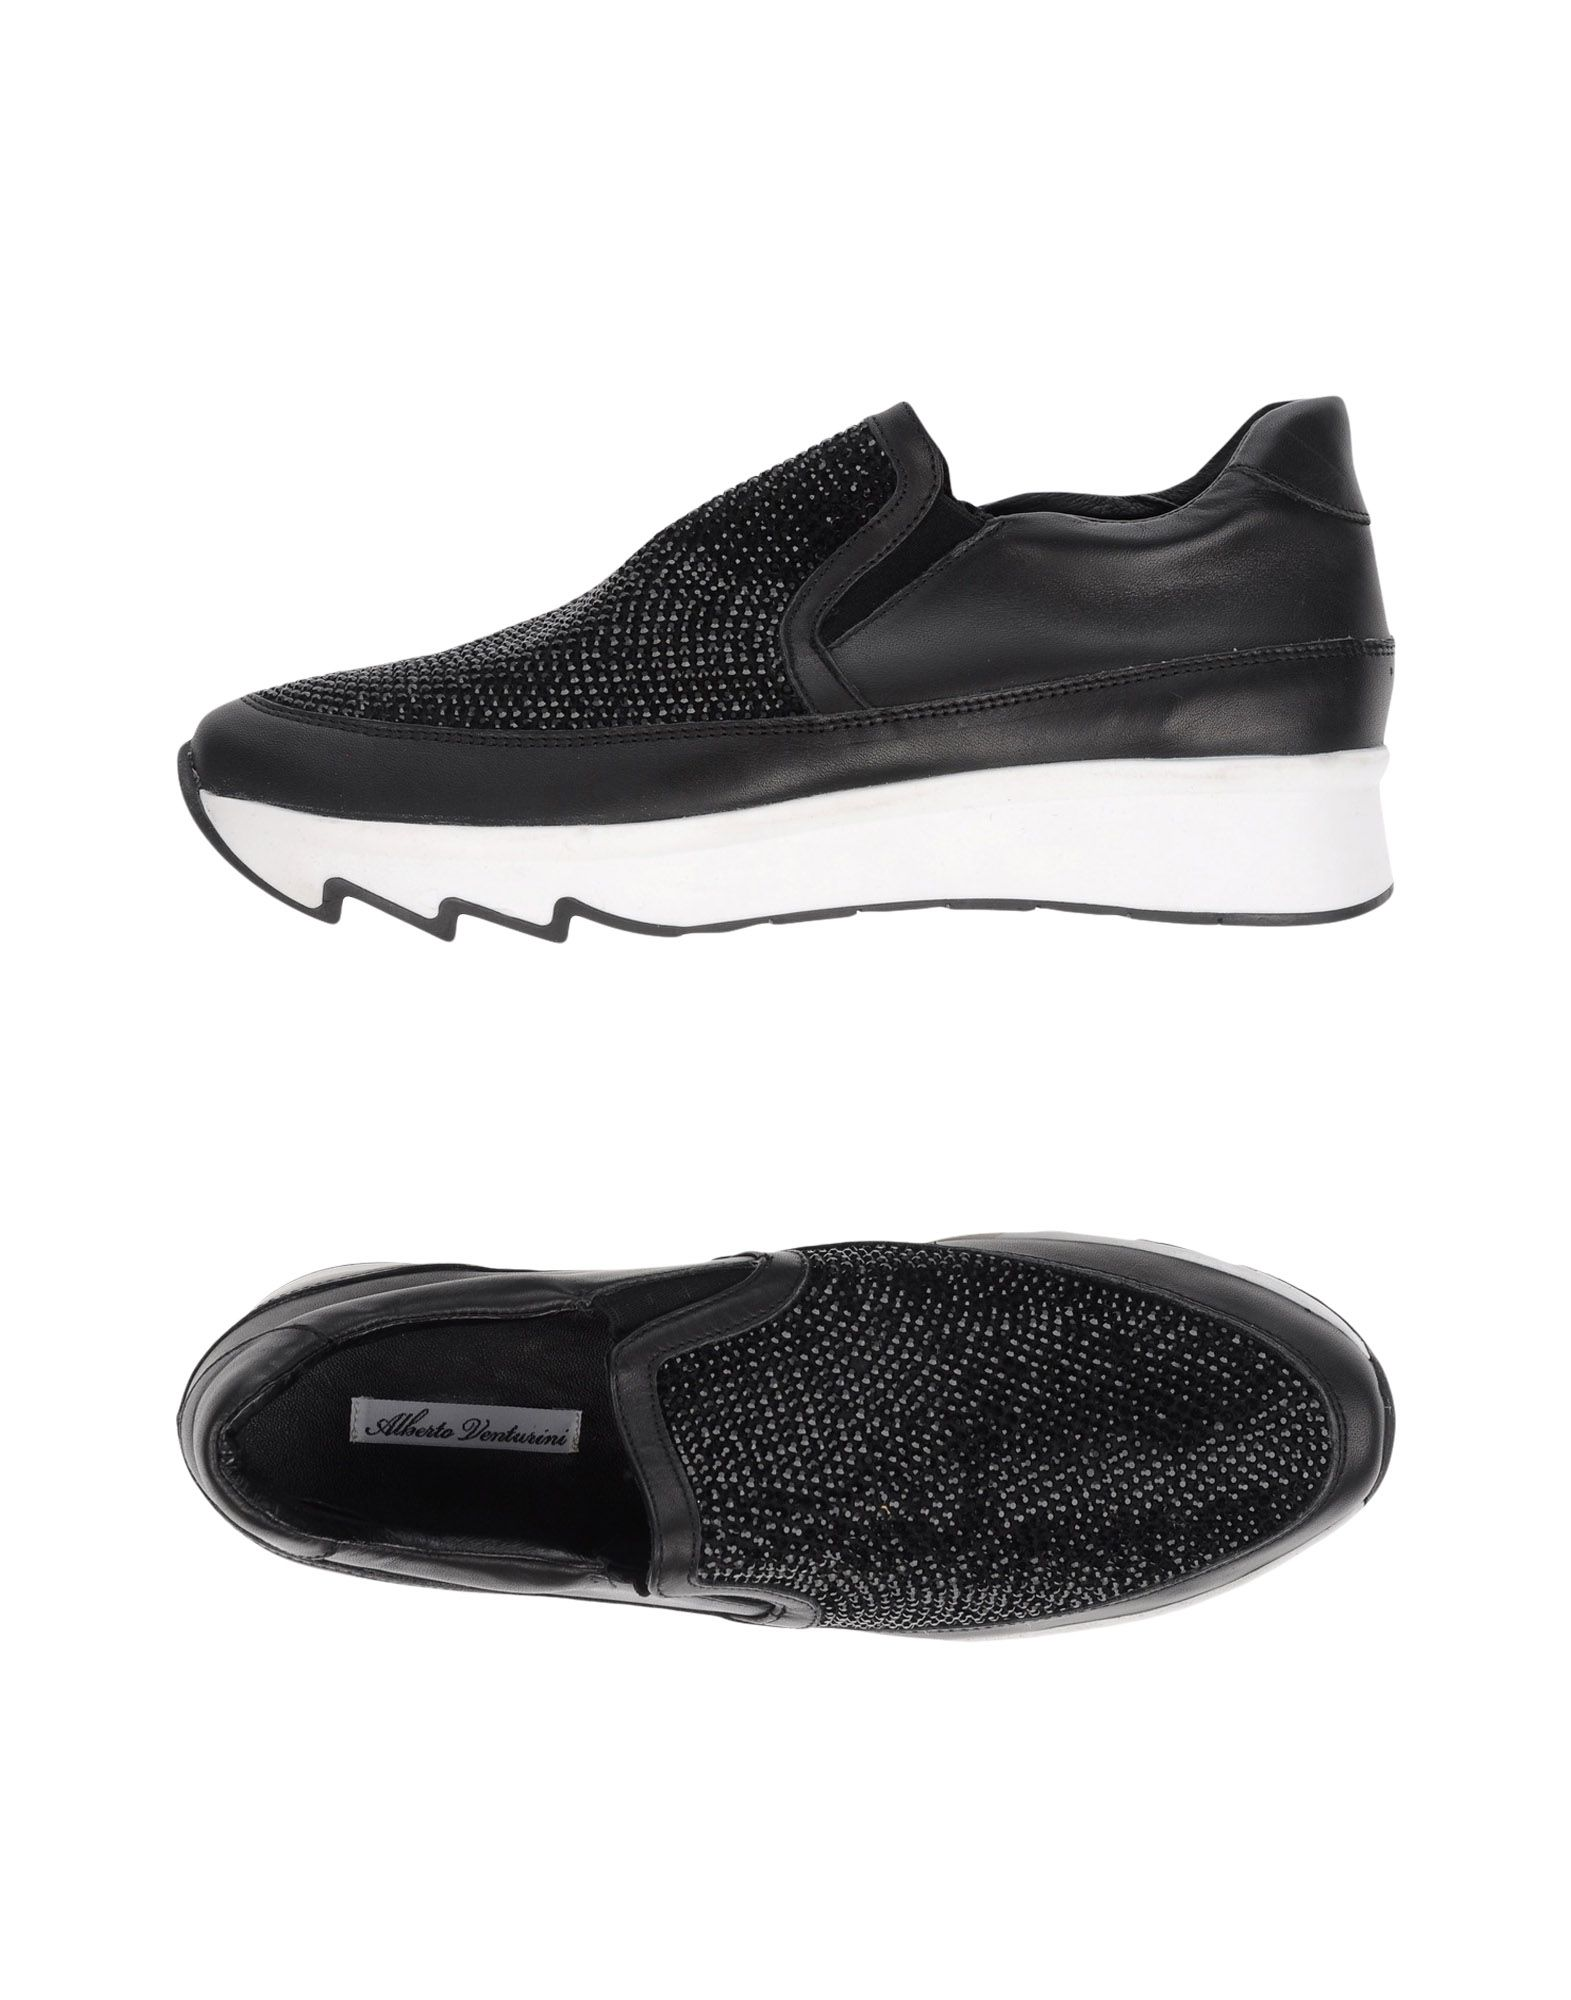 Sneakers Alberto Venturini Femme - Sneakers Alberto Venturini sur